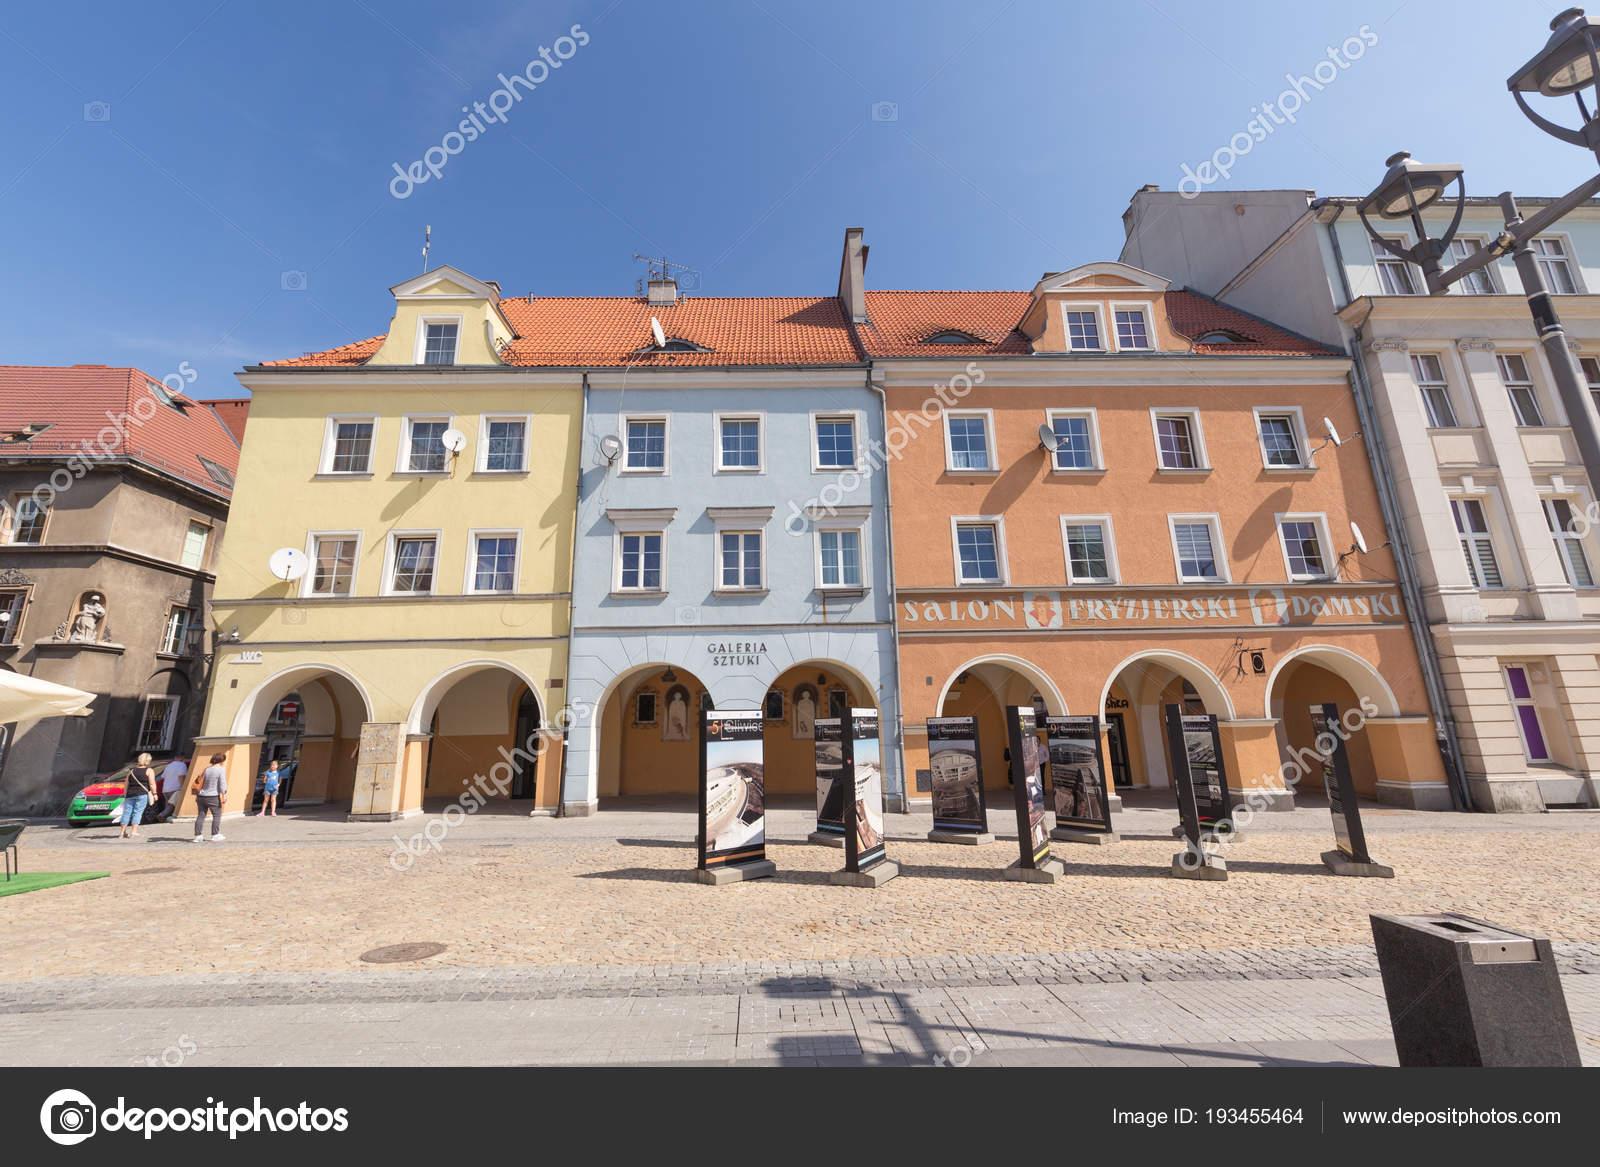 Gliwice Silesia Main Market City Center Historical Tenements April